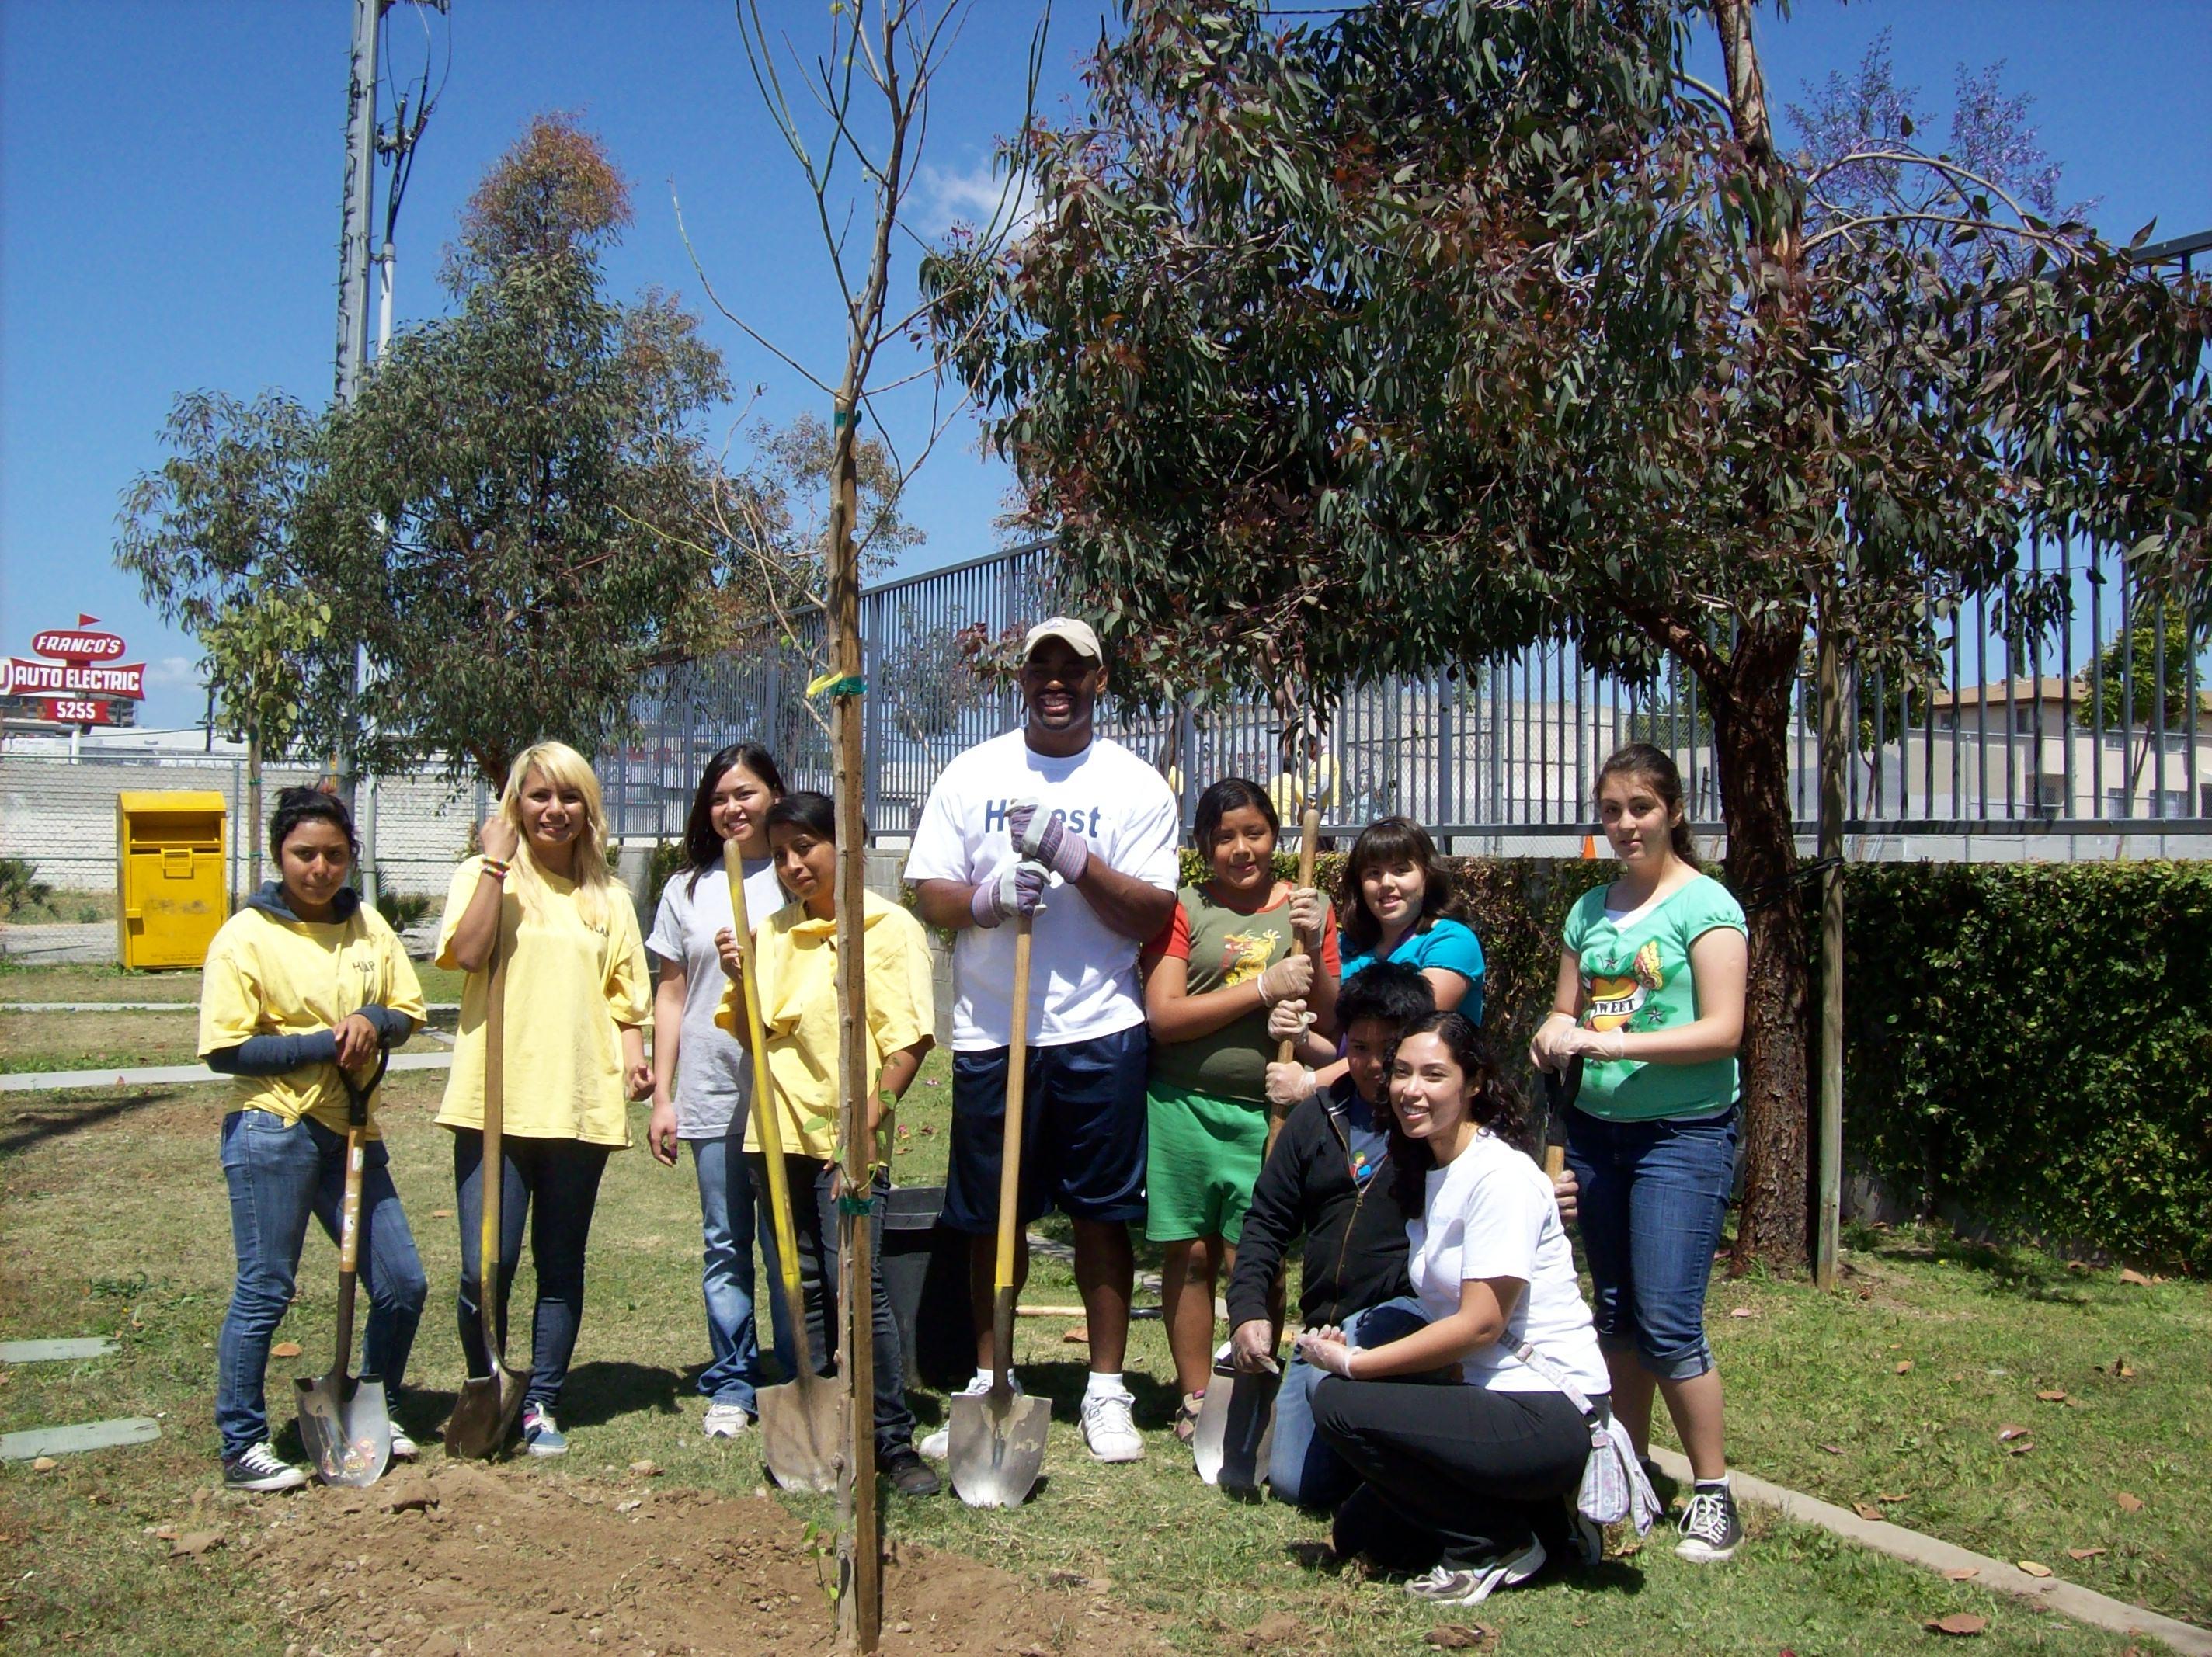 youth job training and mentoring los angeles beautification team planting 042 multnomah6 kids painting 3jpg kids painting 2 kids painting 01 kid painting art8 100 1328 100 1326